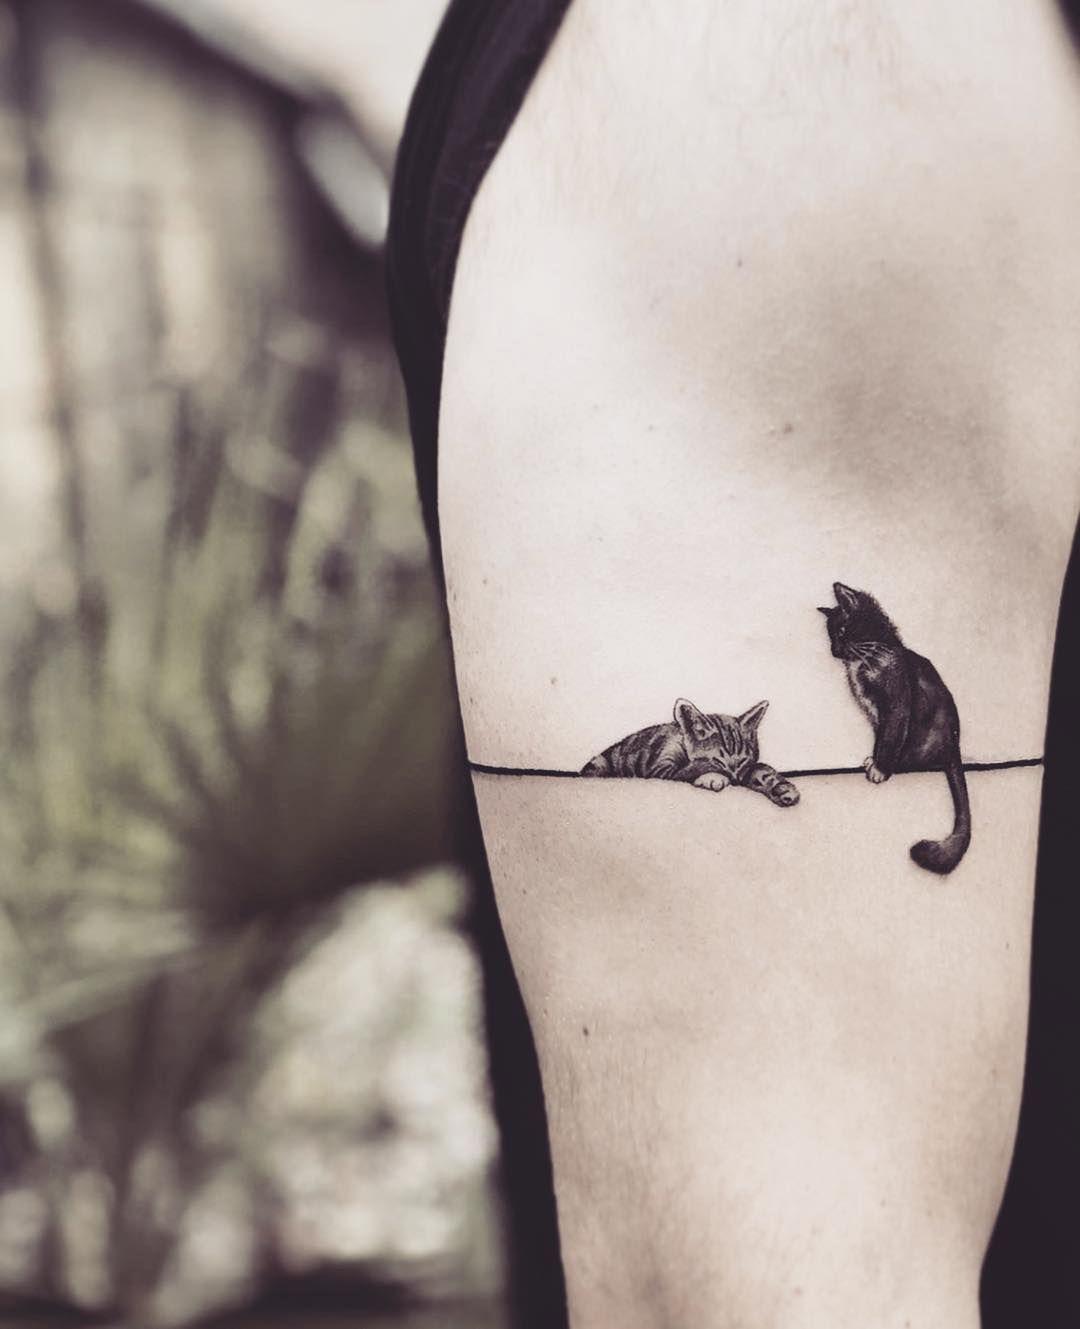 tatuagem feminina de gatos